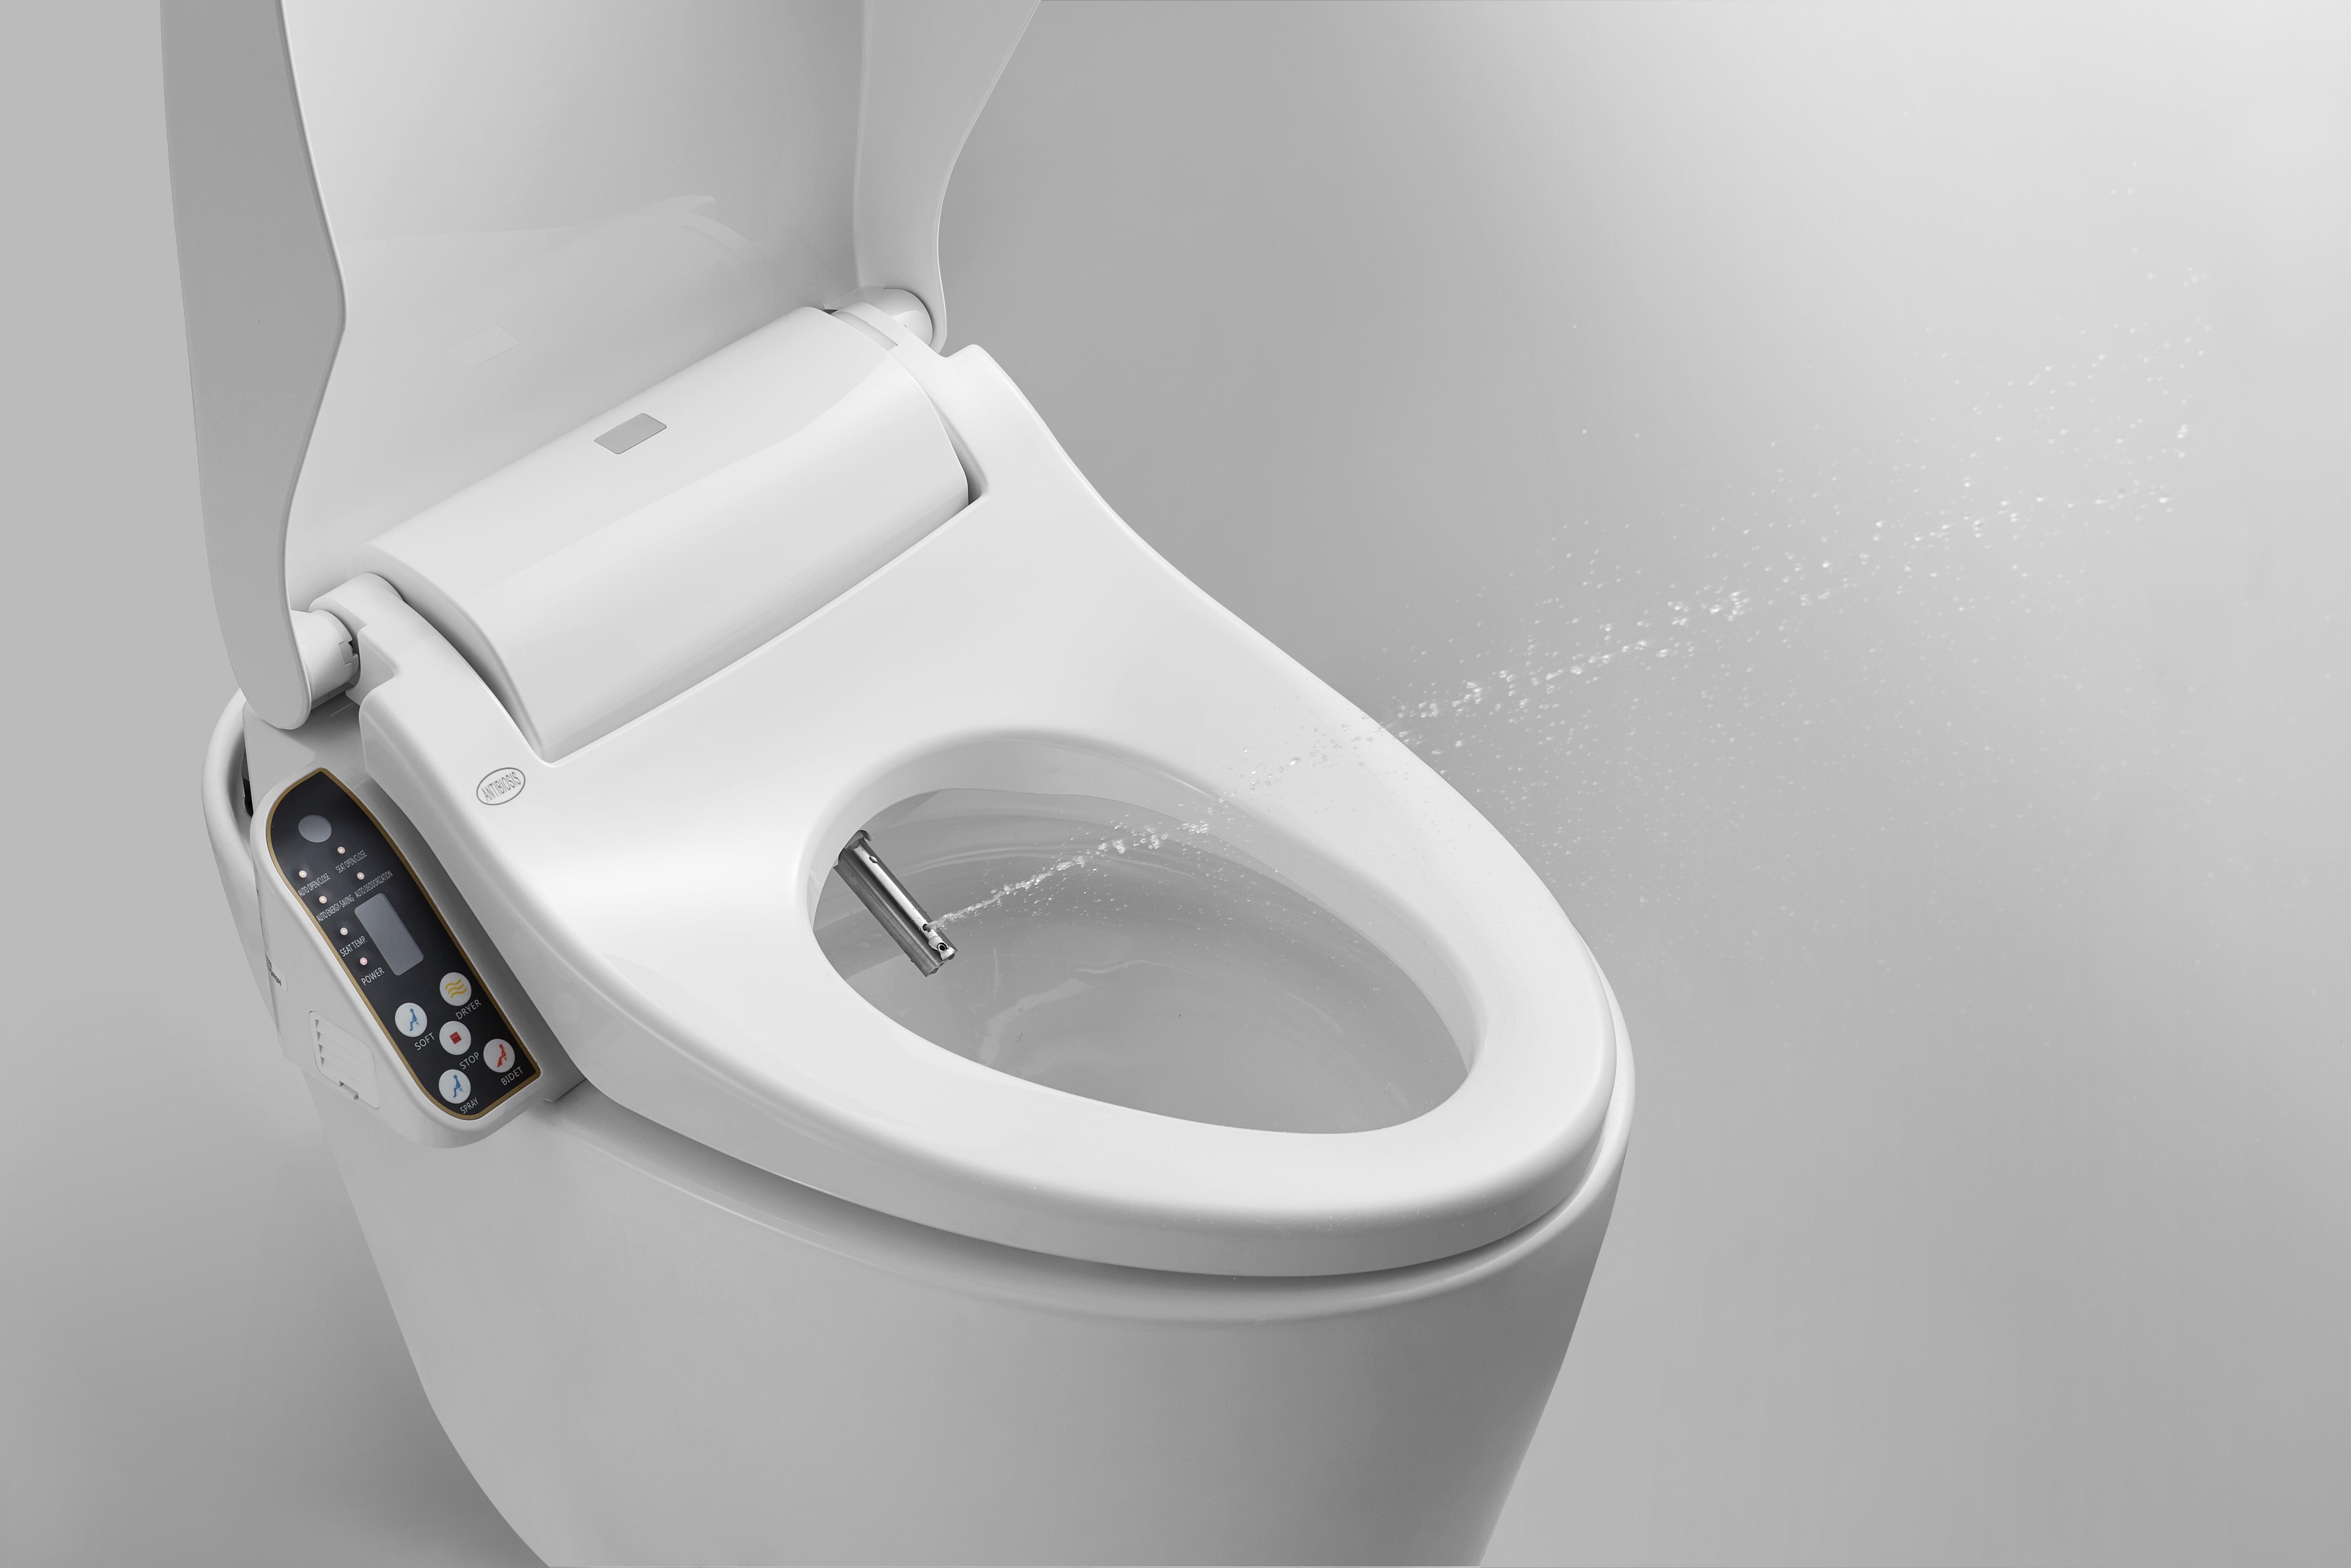 Household Bathroom Electronic Toilet, Bathroom Seat Cover